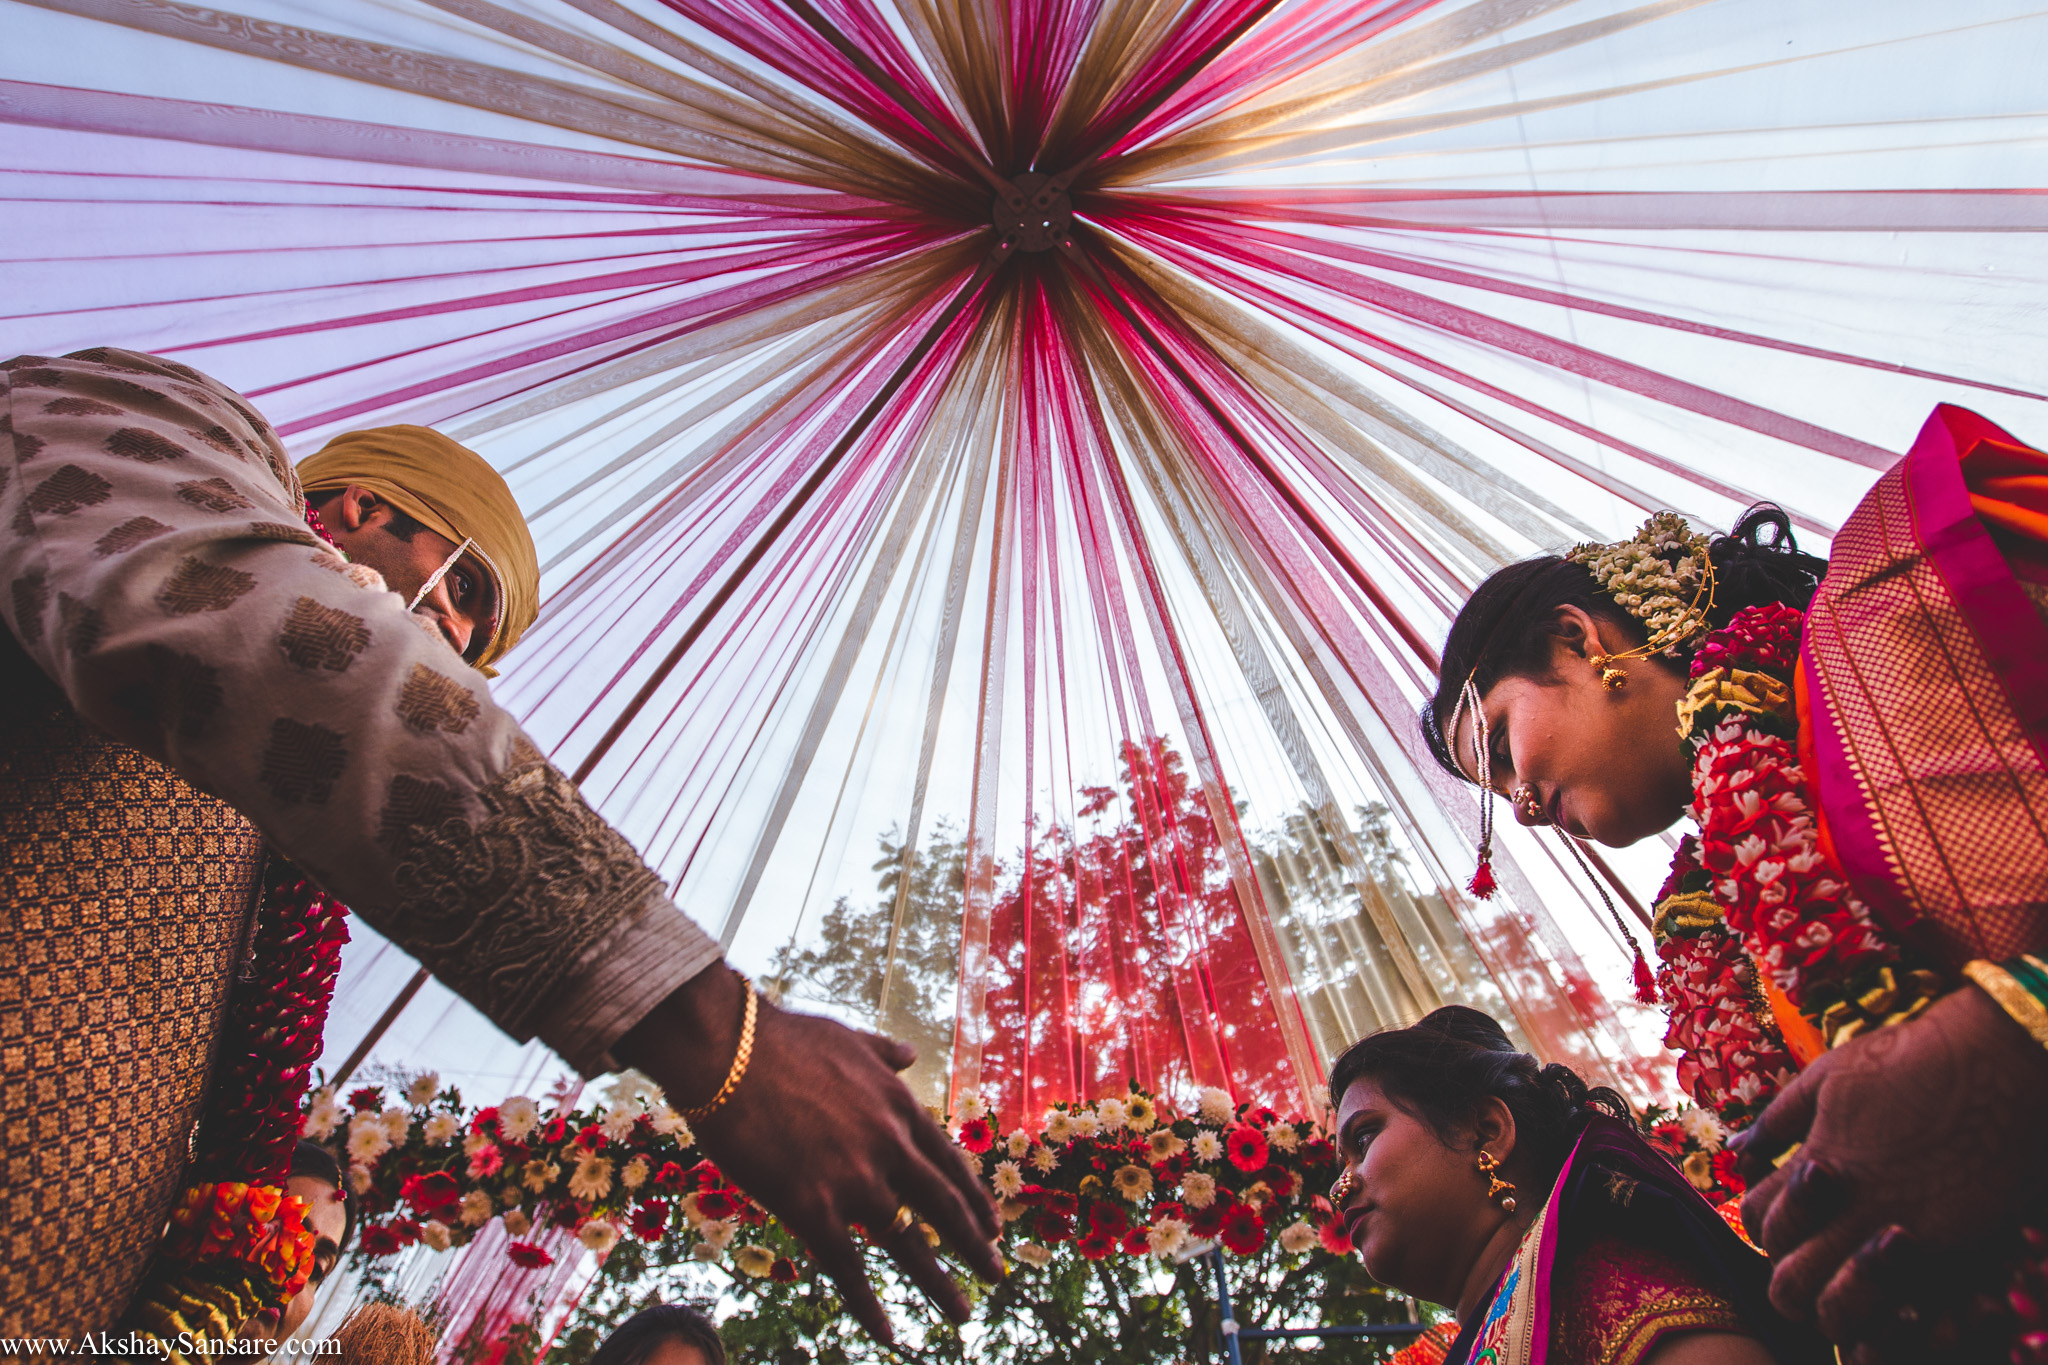 Salil x Kimaya Akshay Sansare Photography Candid wedding Photographer in mumbai best(35).jpg